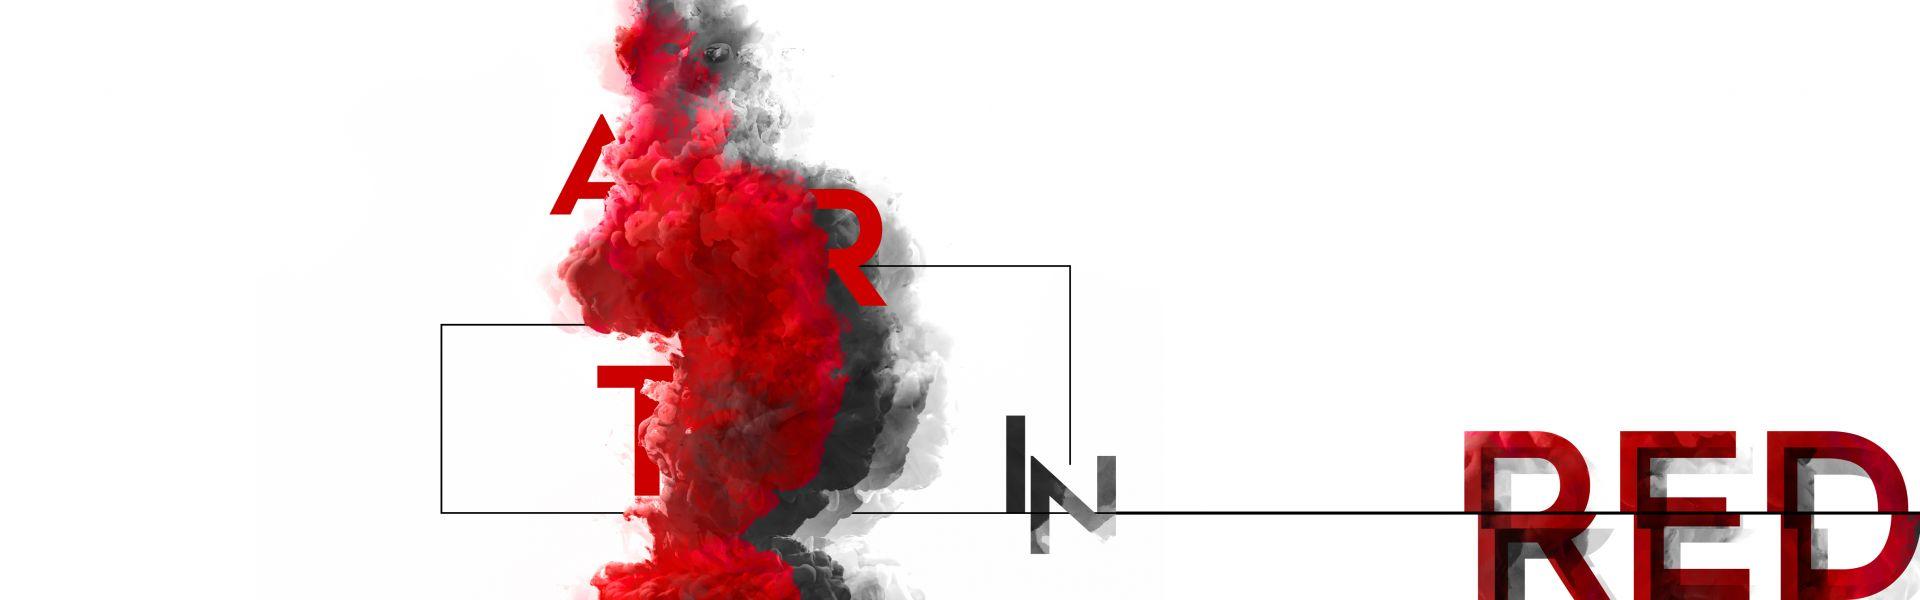 art-in-red-profile-slider-high-01